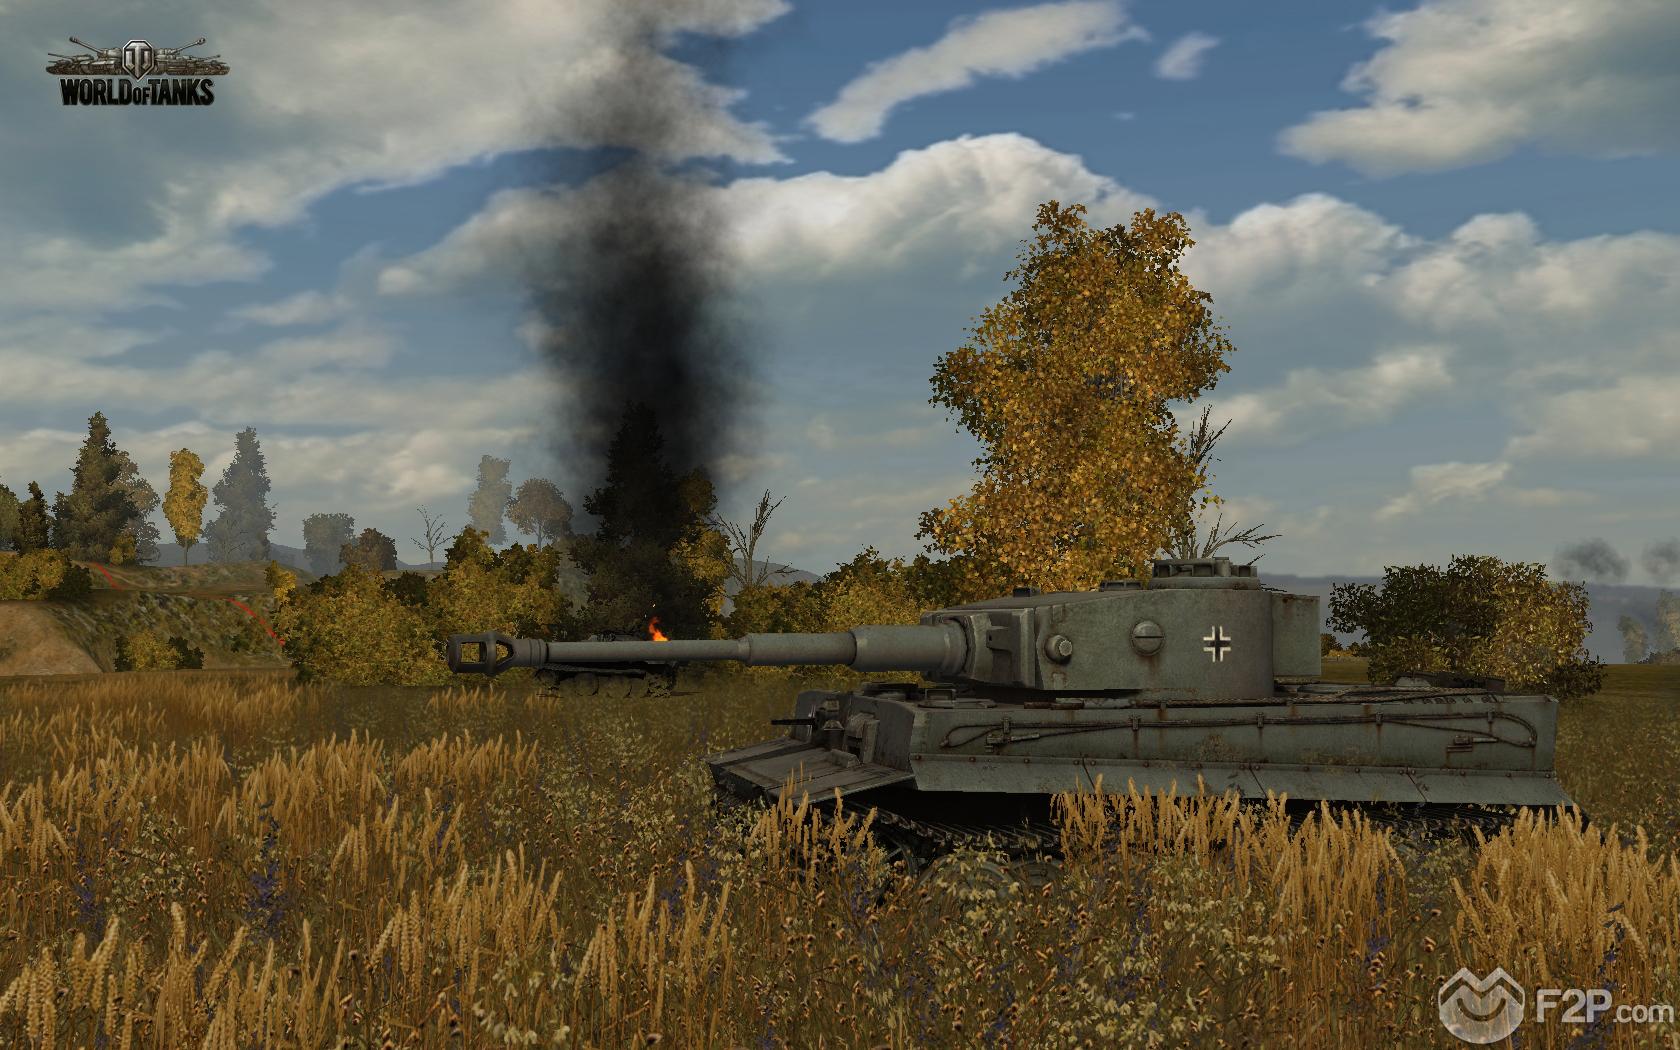 Click image for larger version.Name:World of Tanks 57.jpgViews:130Size:1.43 MBID:3840